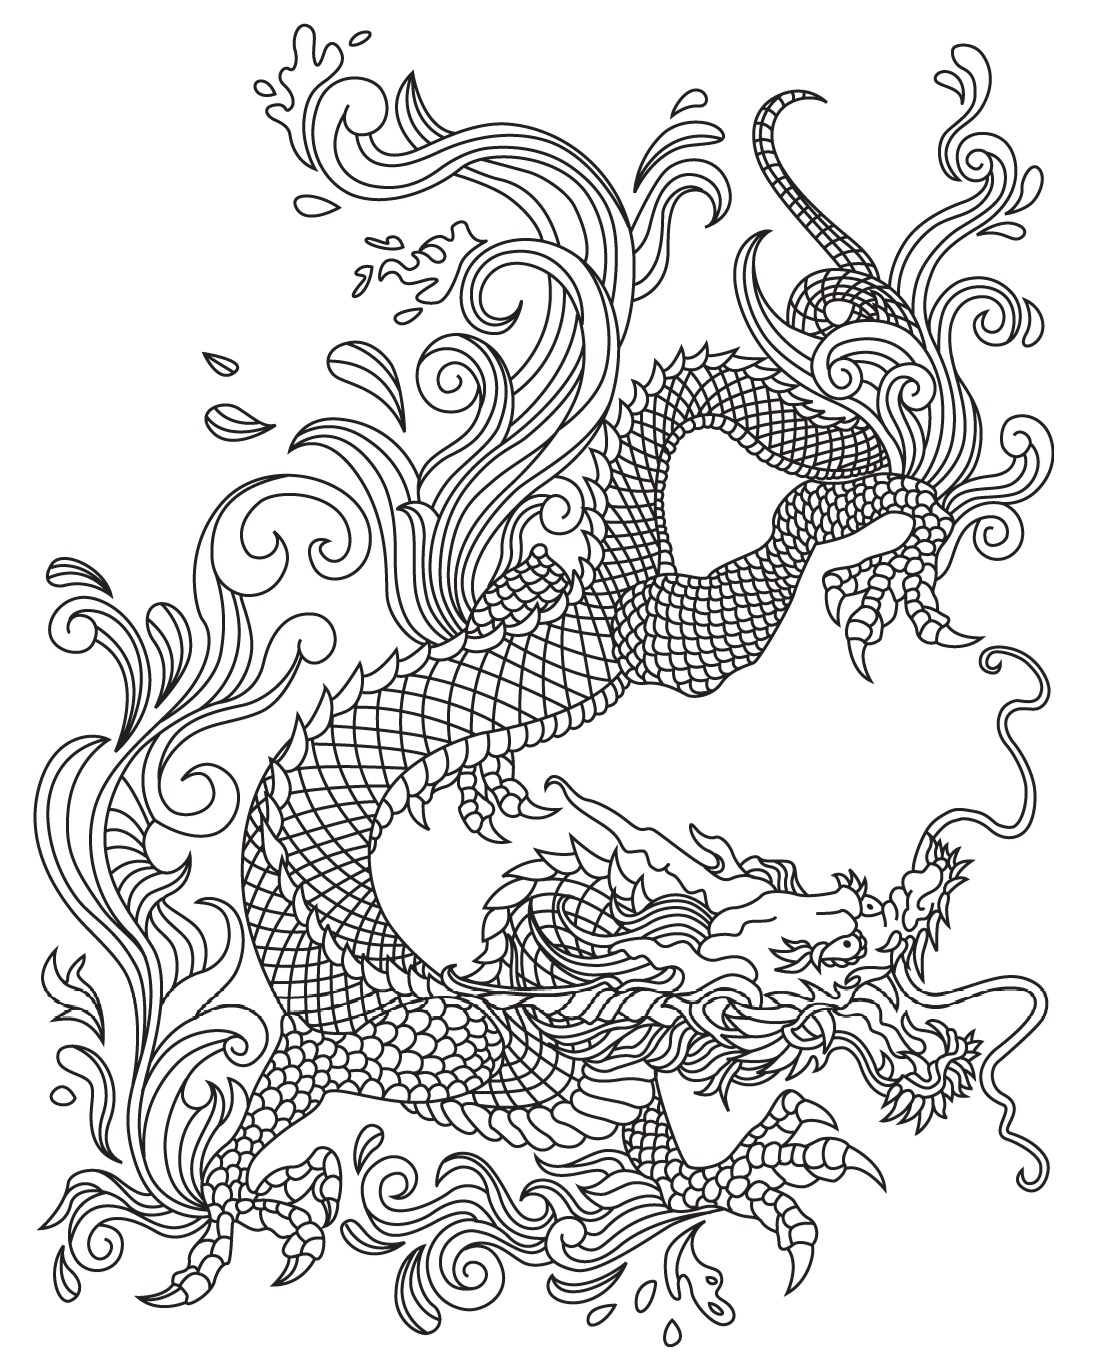 1098x1369 Japanese Dragon Colorish Coloring Book For Adults Mandala Relax